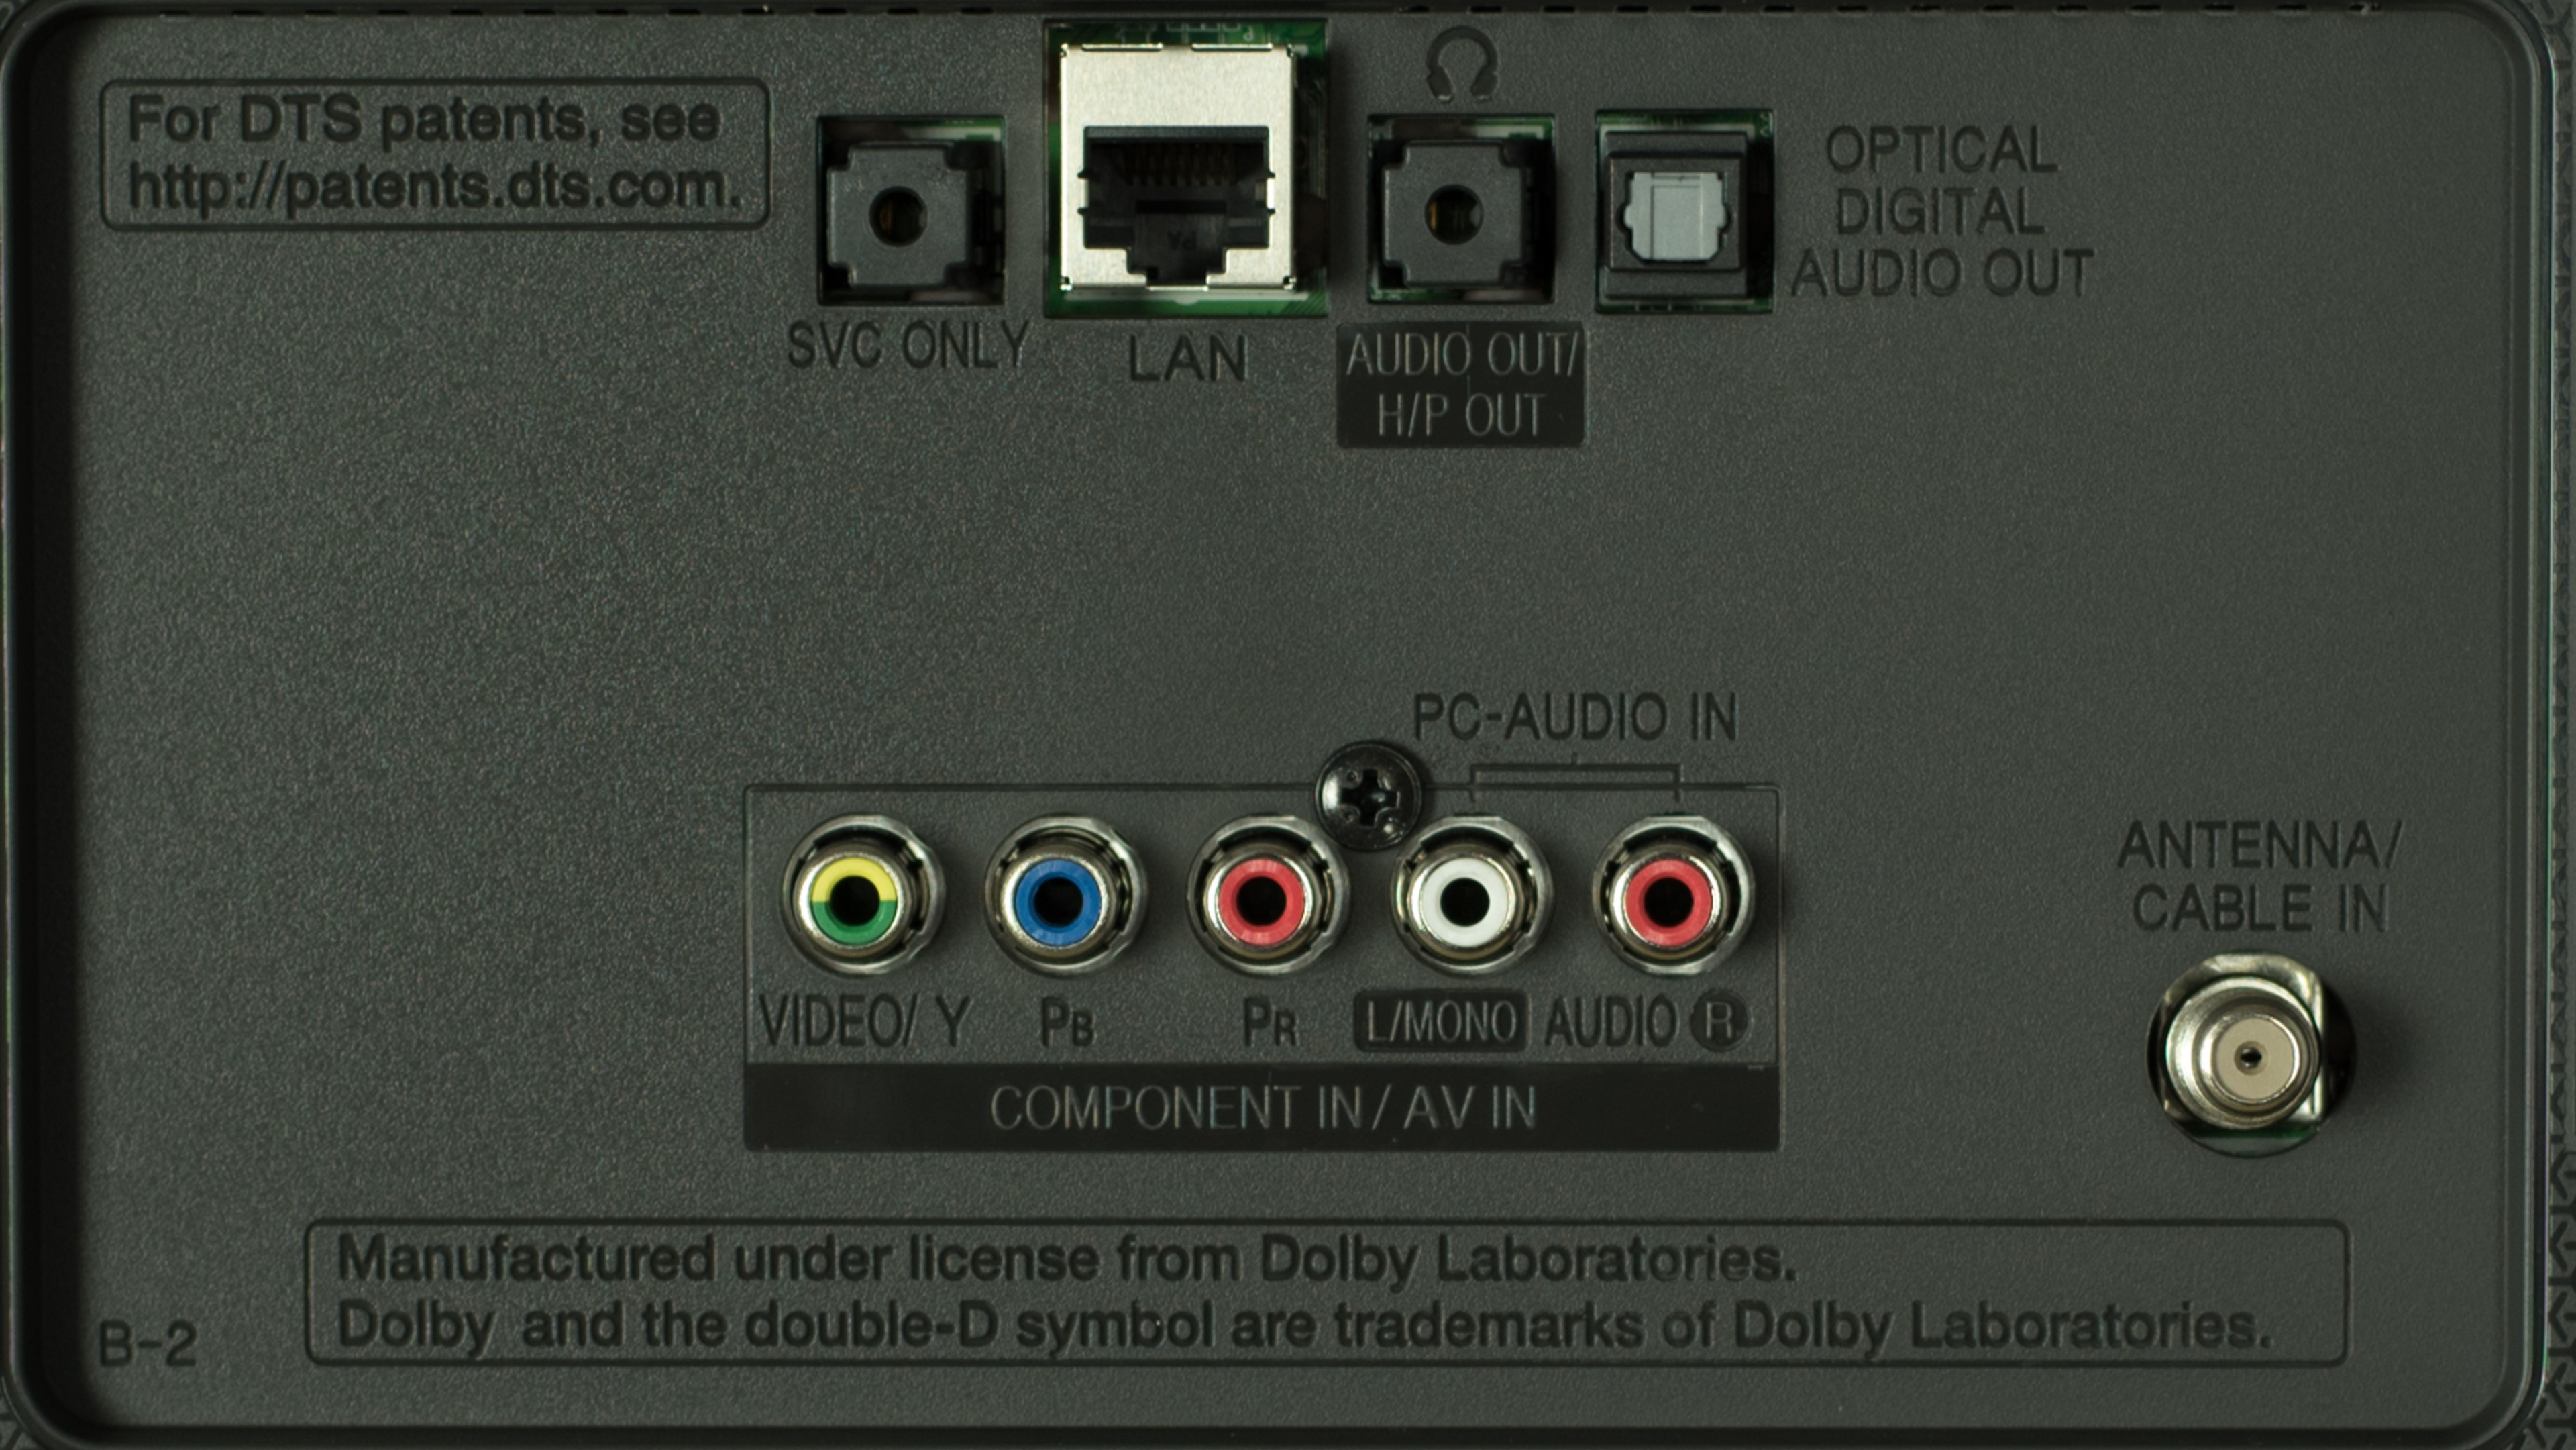 LG UF7700 Review (60UF7700, 65UF7700, 70UF7700, 79UF7700)